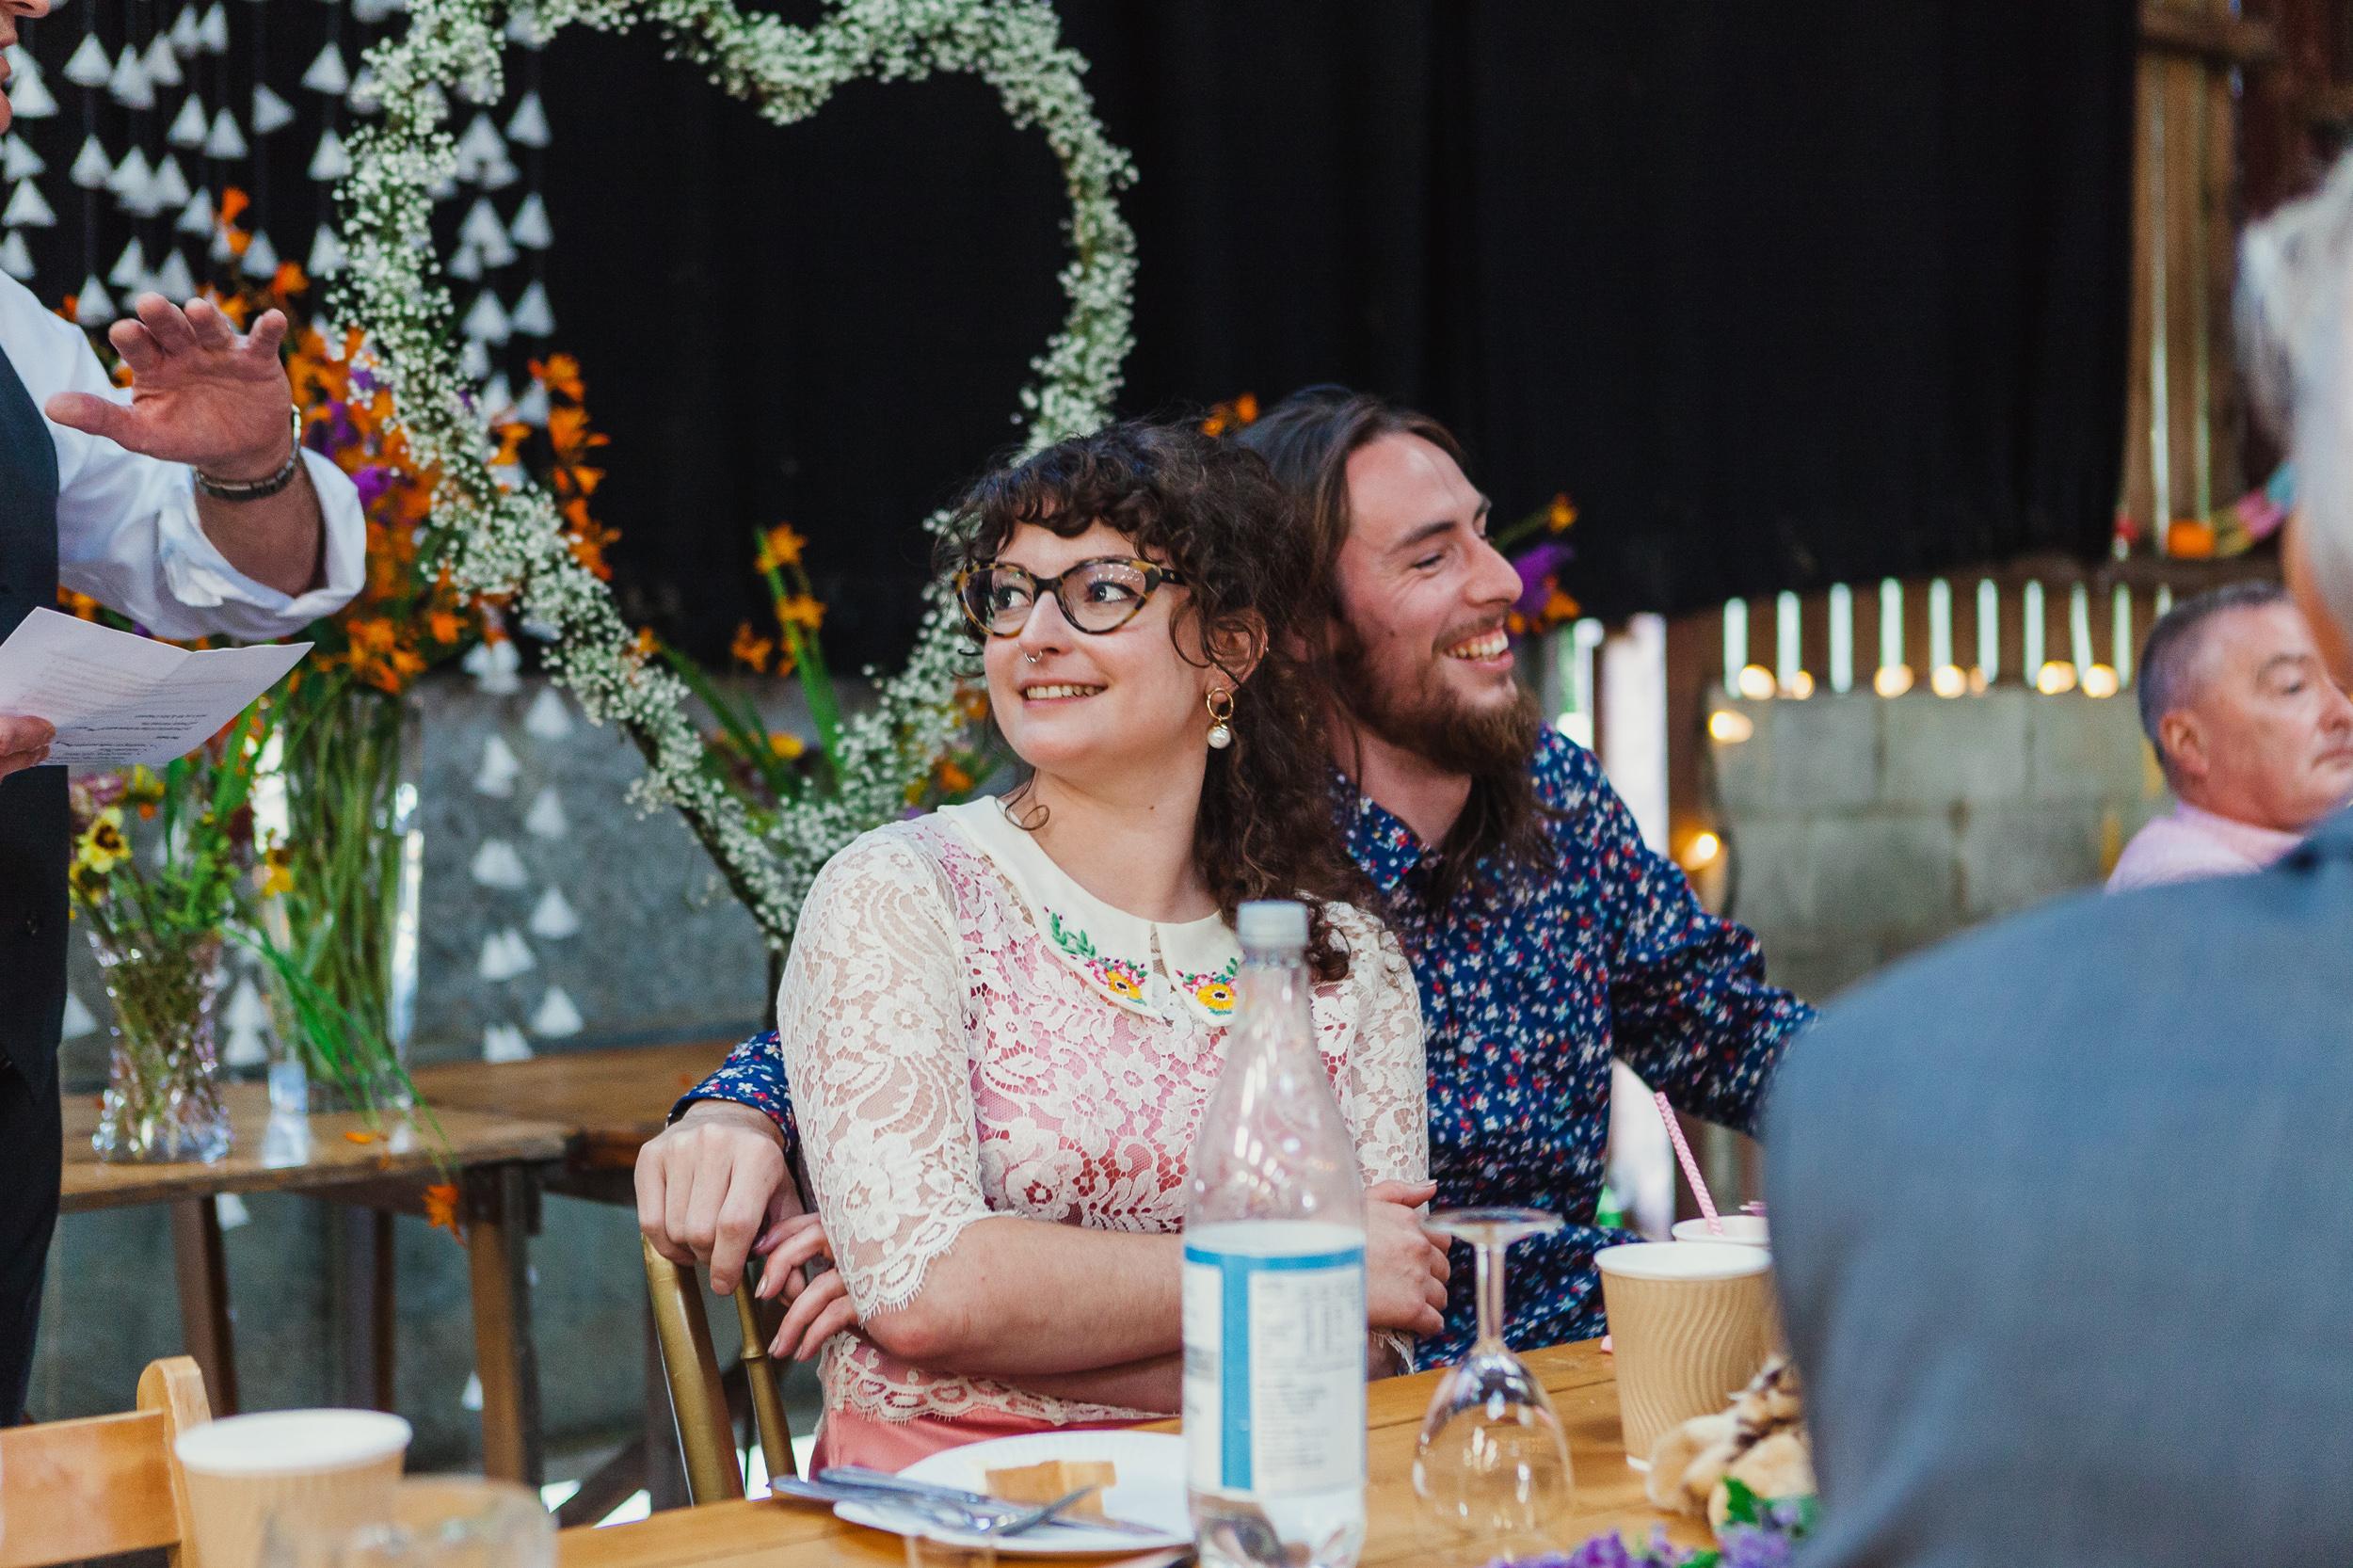 Emma-Coloured-Wedding-Dress-Sheffield-Kate-Beaumont-21.jpg